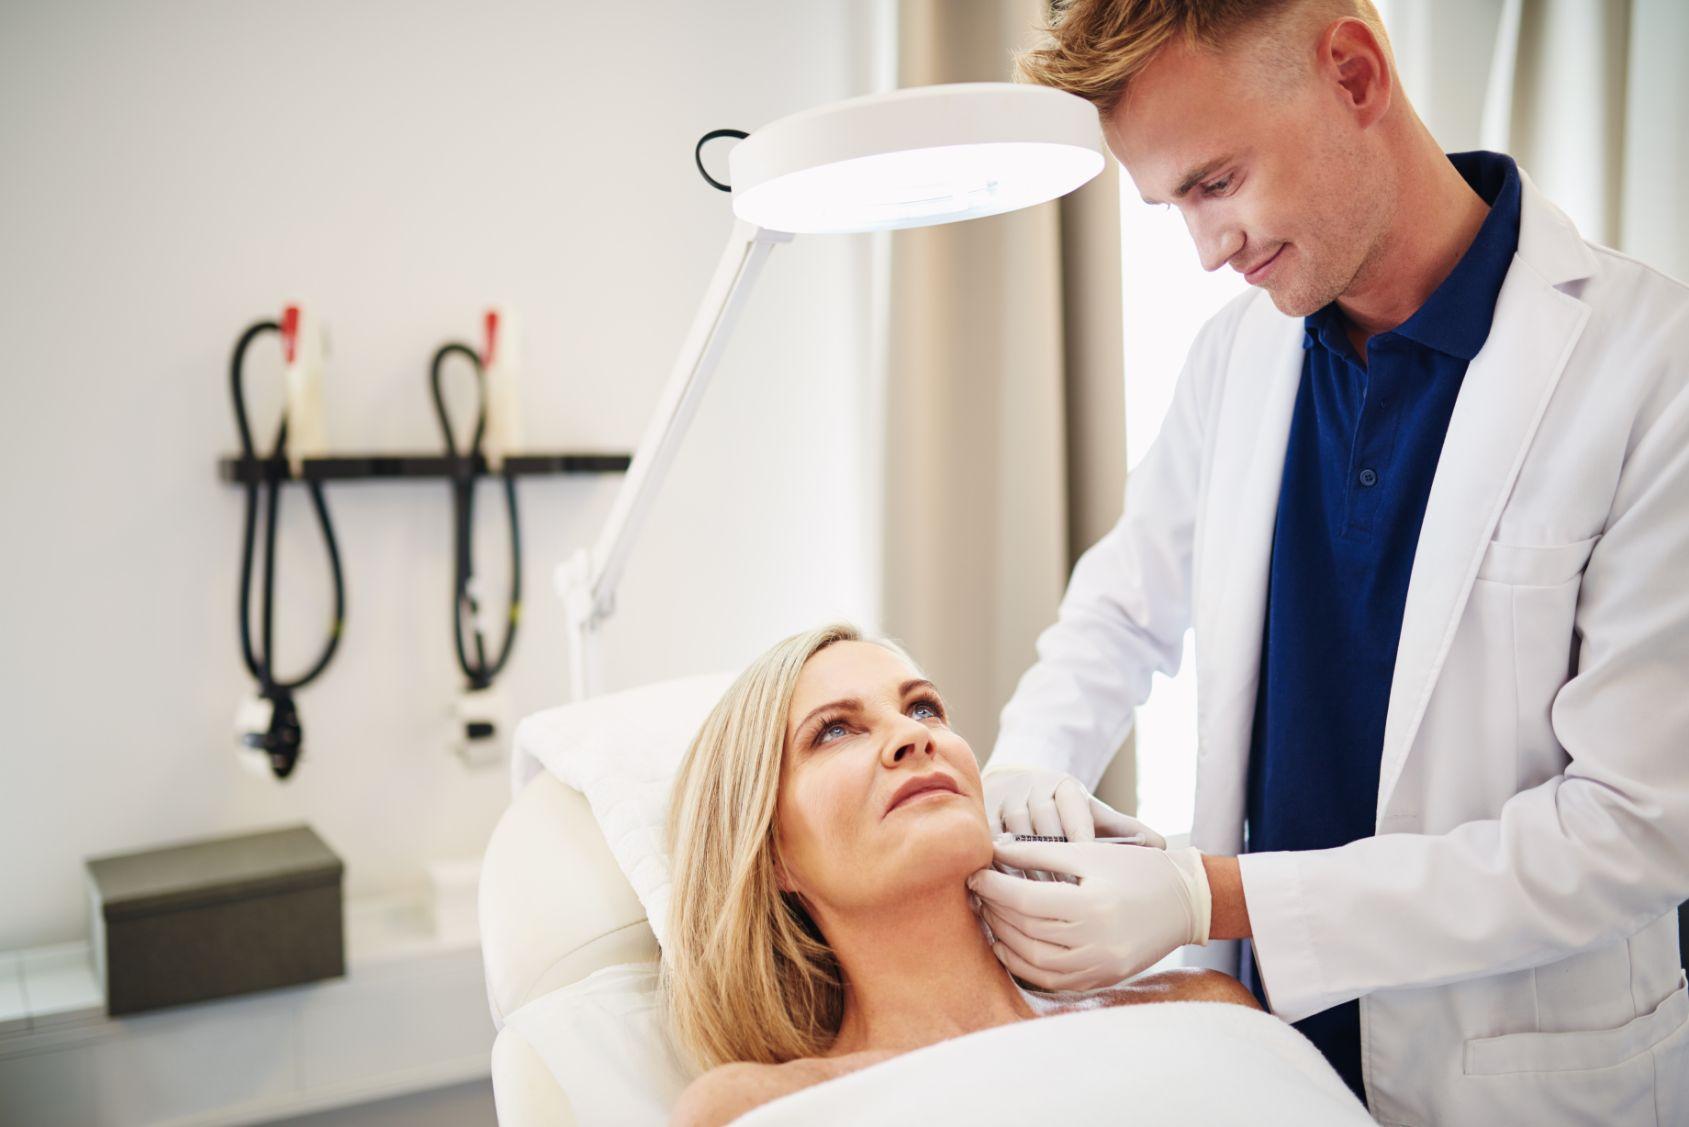 Botox or Juvederm